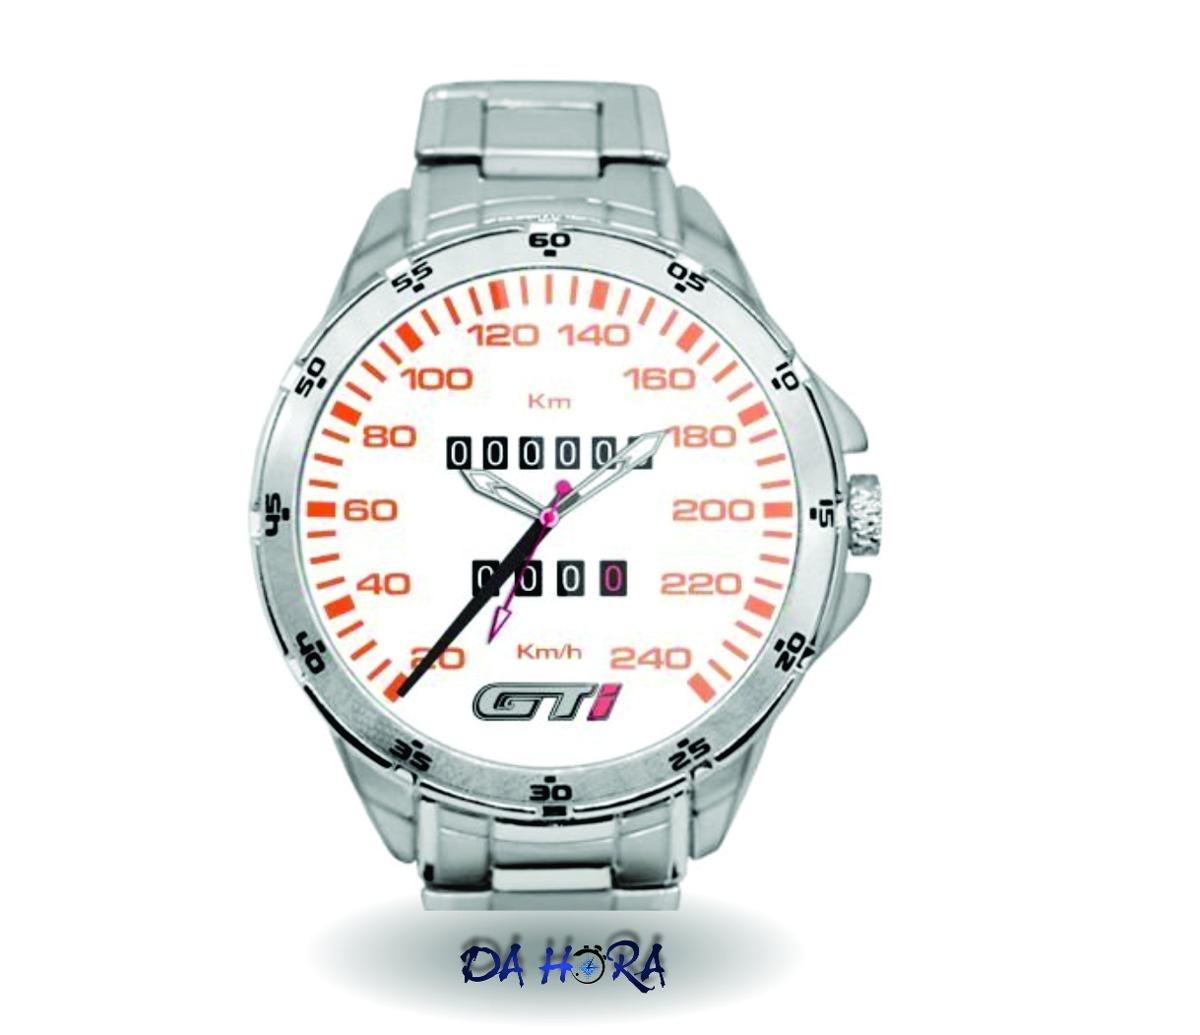 14086100bcc relógio painel gti branco 240 km personalizado. Carregando zoom.